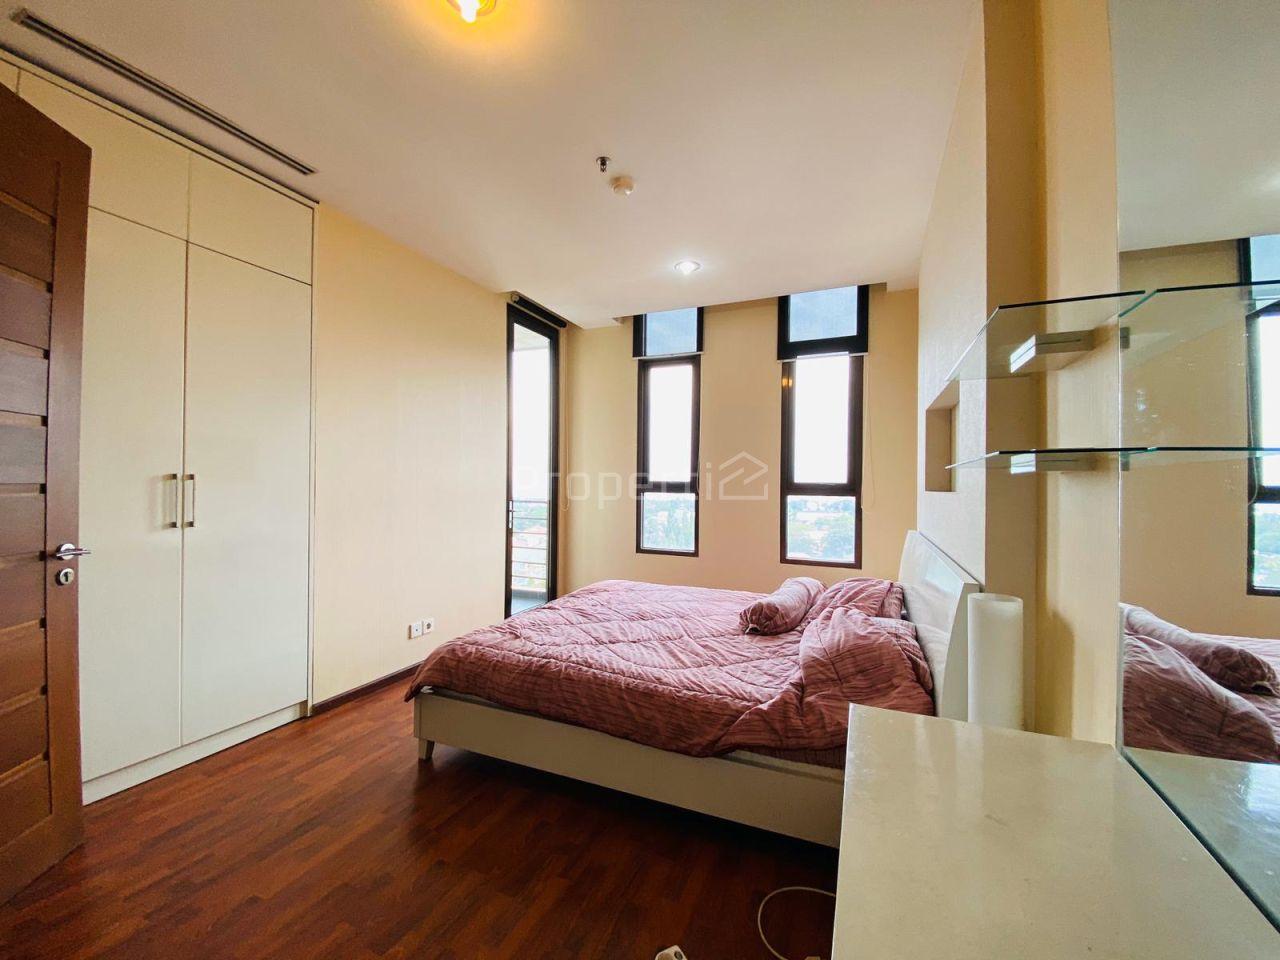 2BR Unit at Dago Butik Apartment, 9th Floor, Kota Bandung